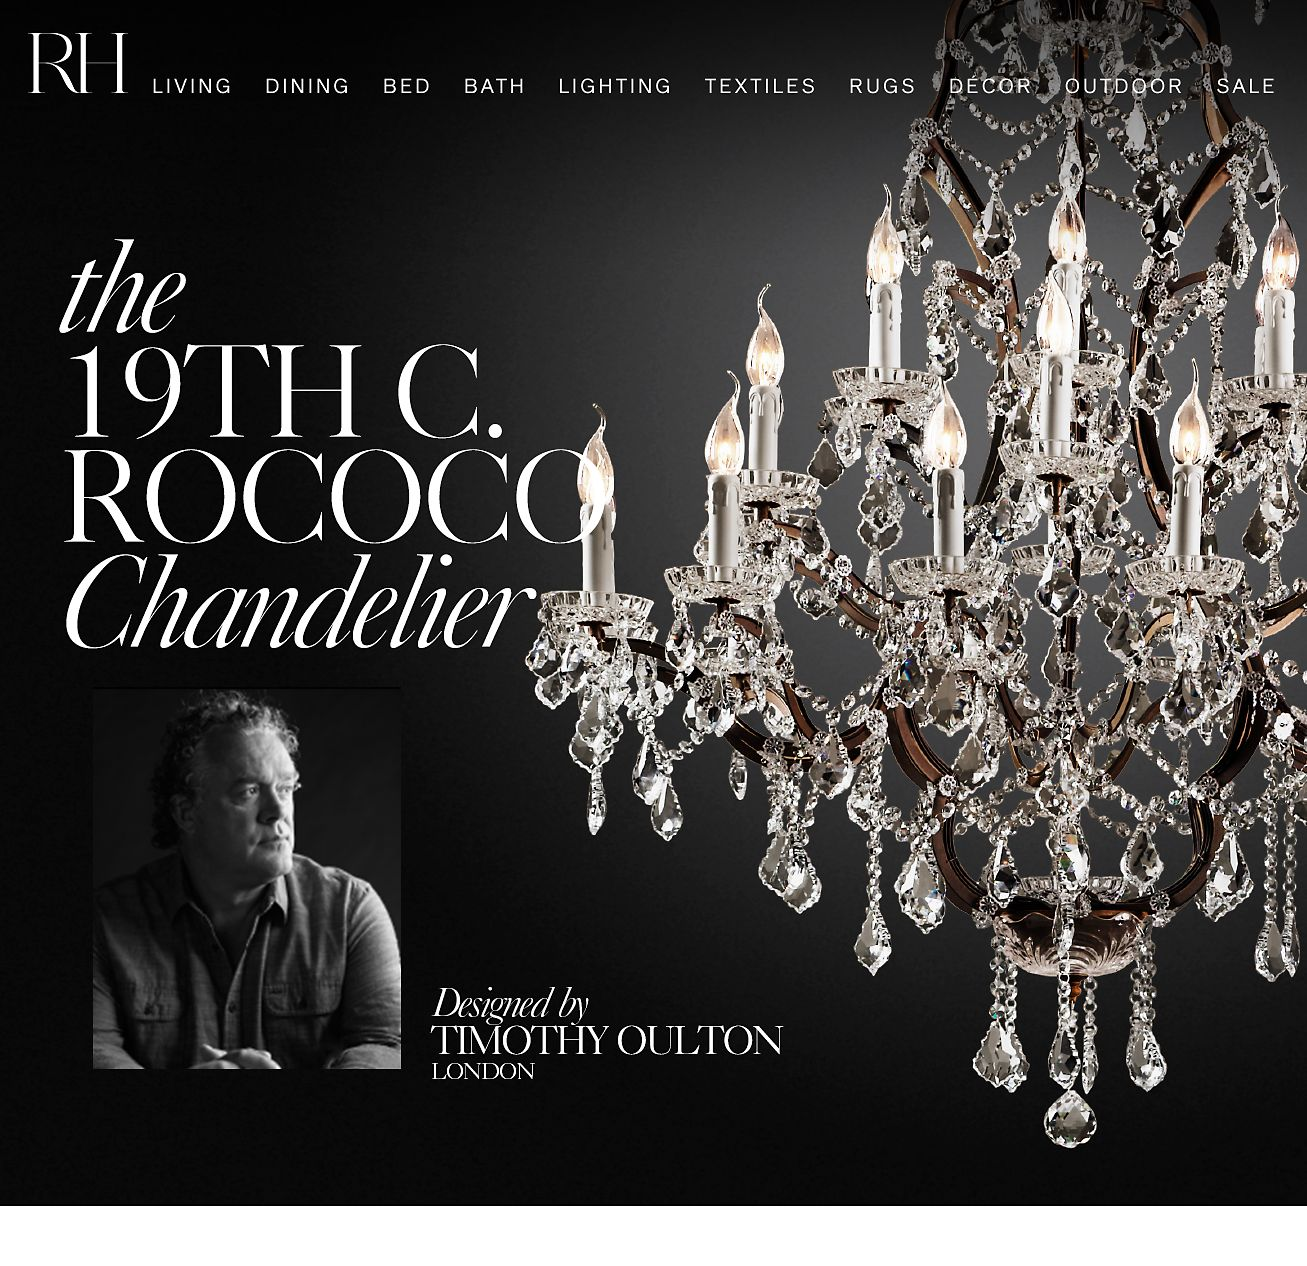 Restoration hardware the 19th c rococo chandelier designed by the 19th c rococo chandelier mozeypictures Gallery